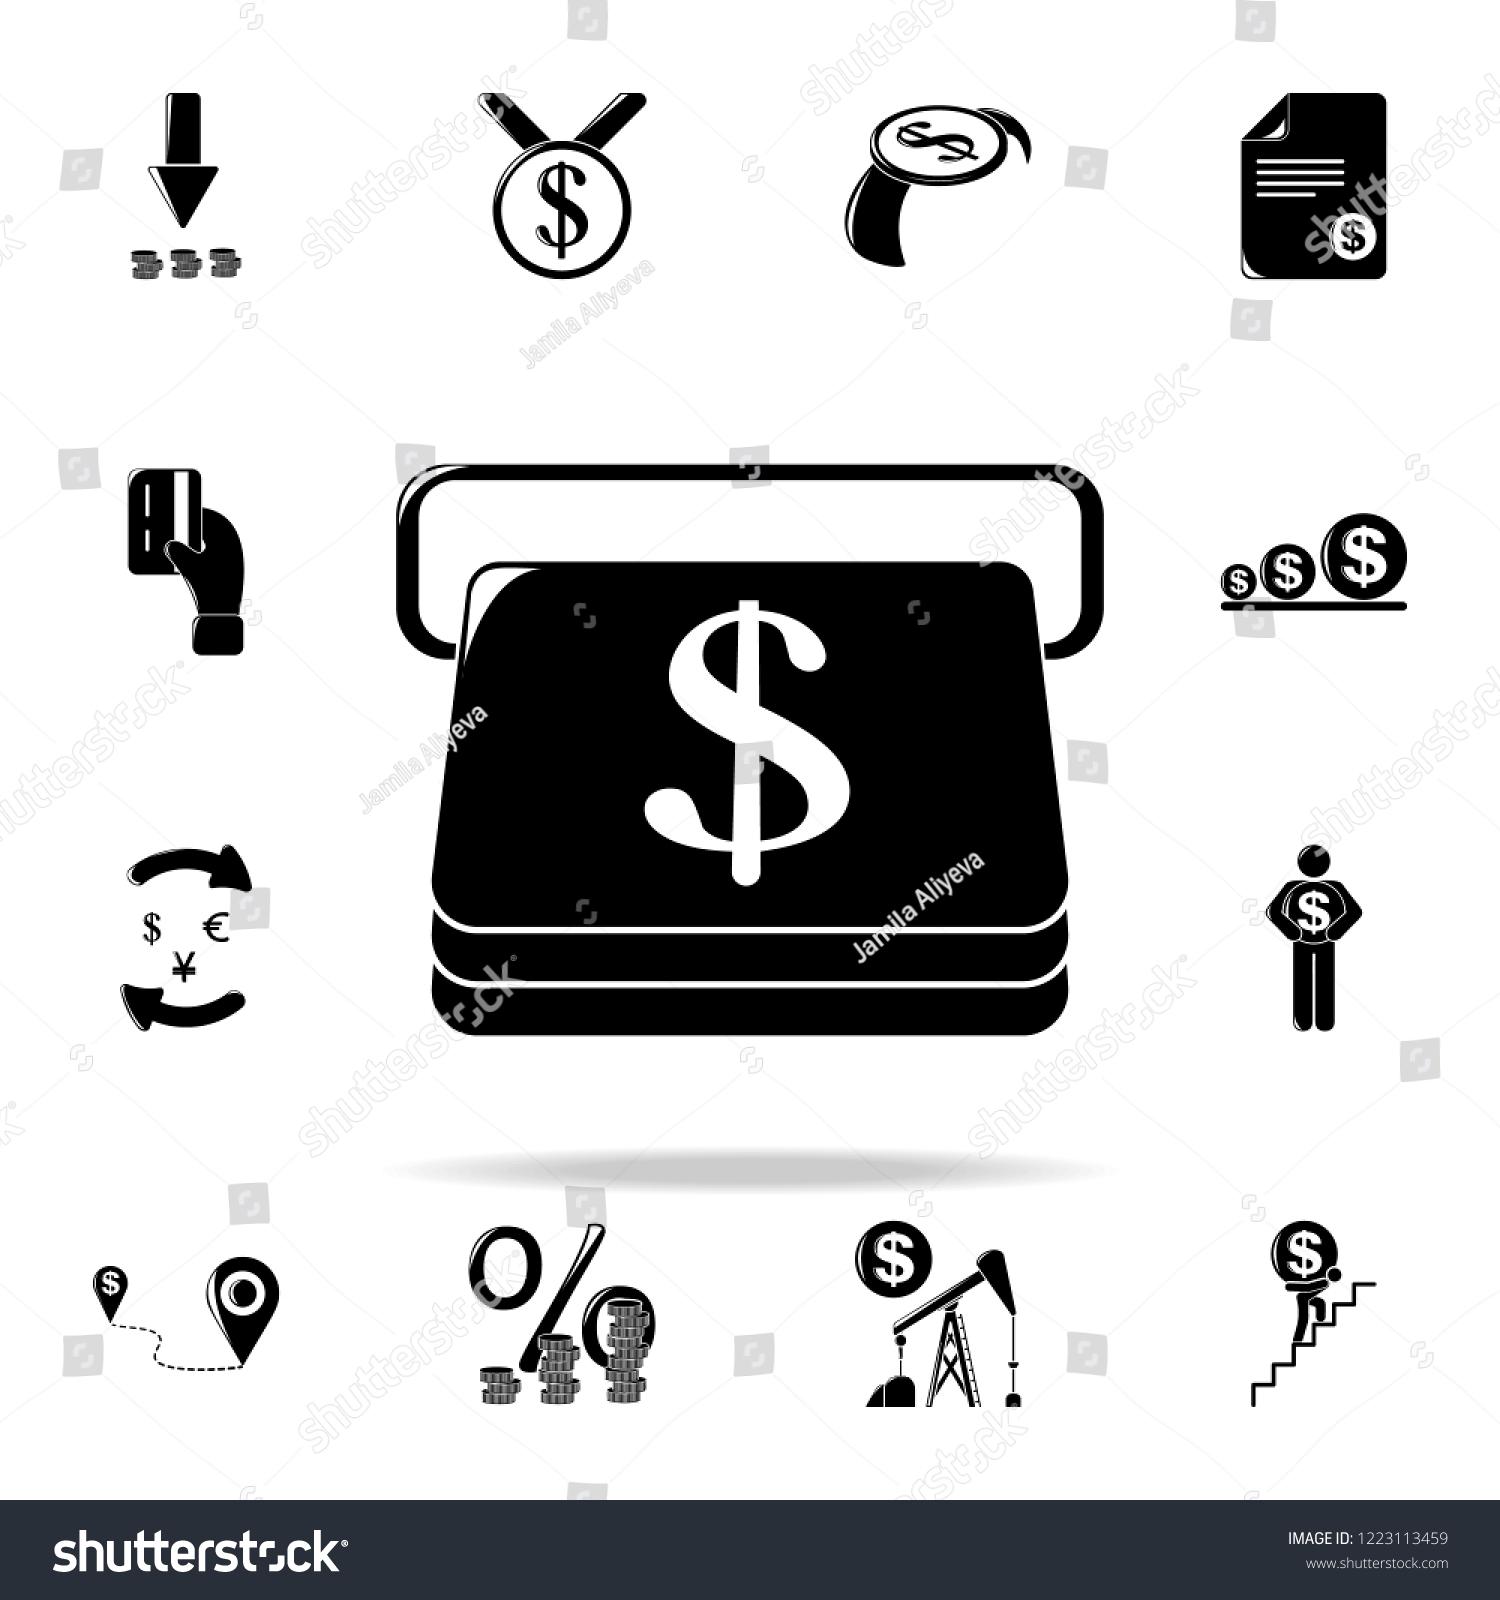 Credit Card Atm Icon Finance Icons เวกเตอร์สต็อก (ปลอดค่า